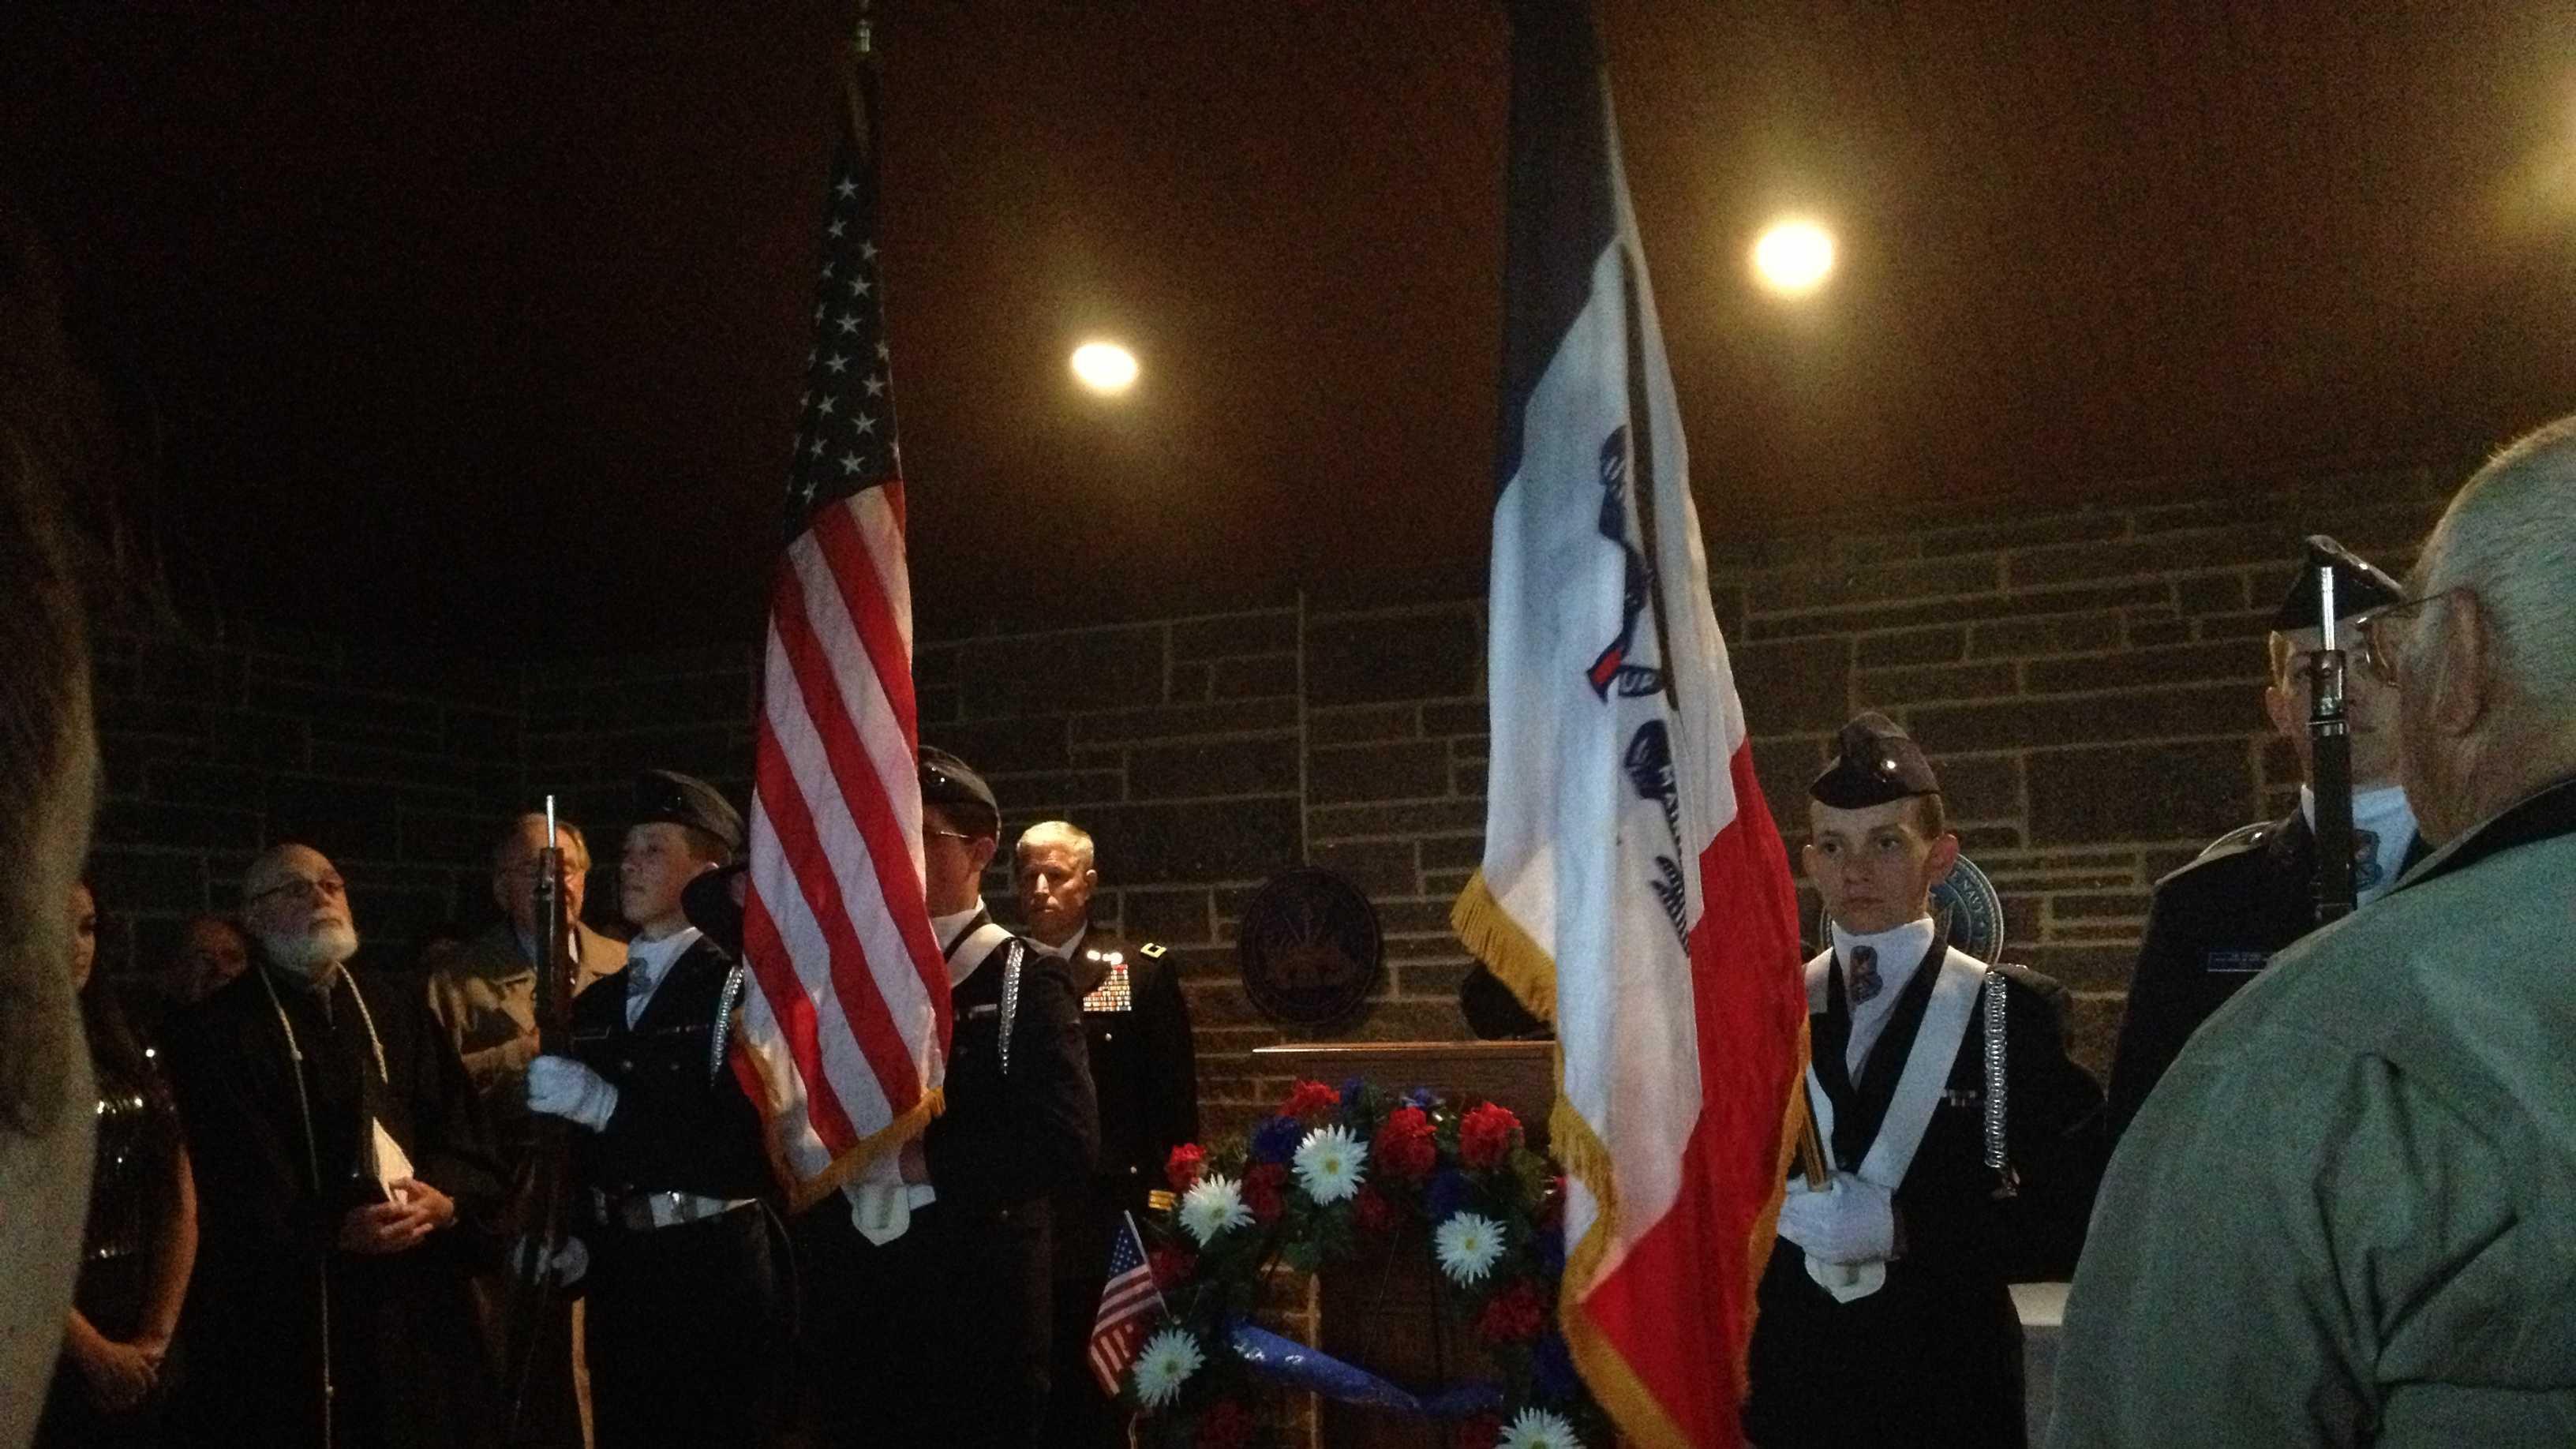 Veterans cemetery service